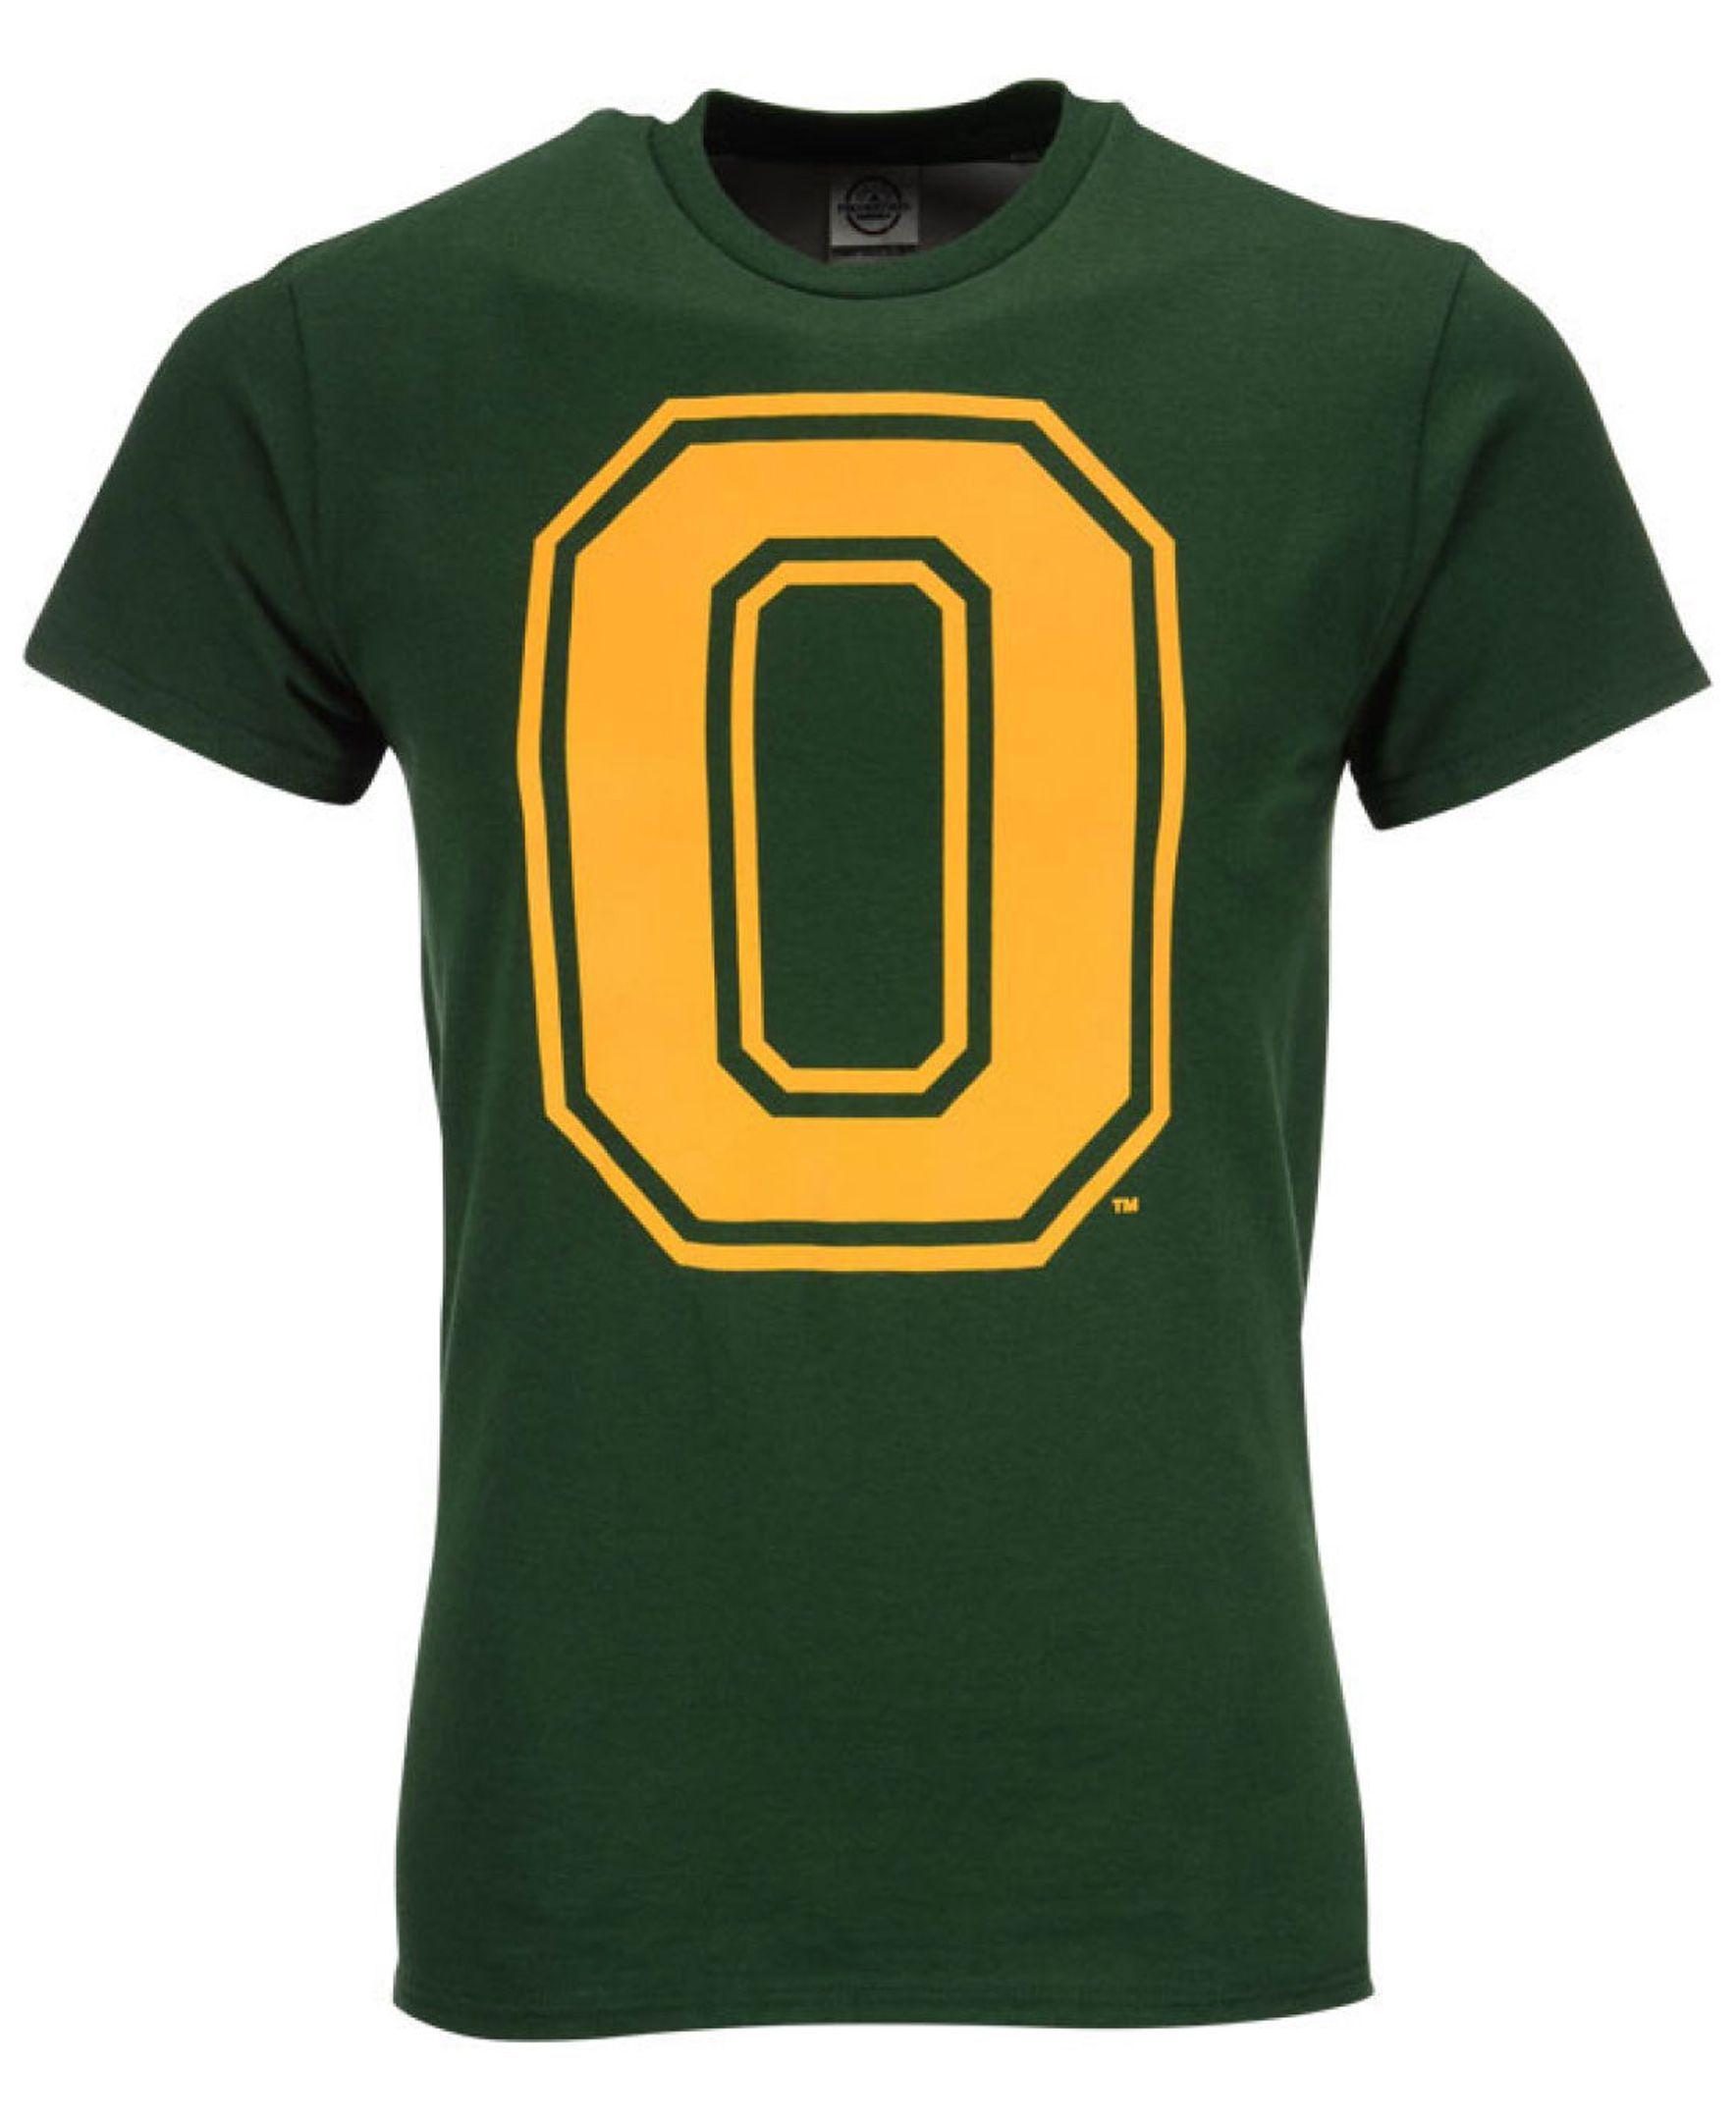 J America Men's Oregon Ducks T-Shirt